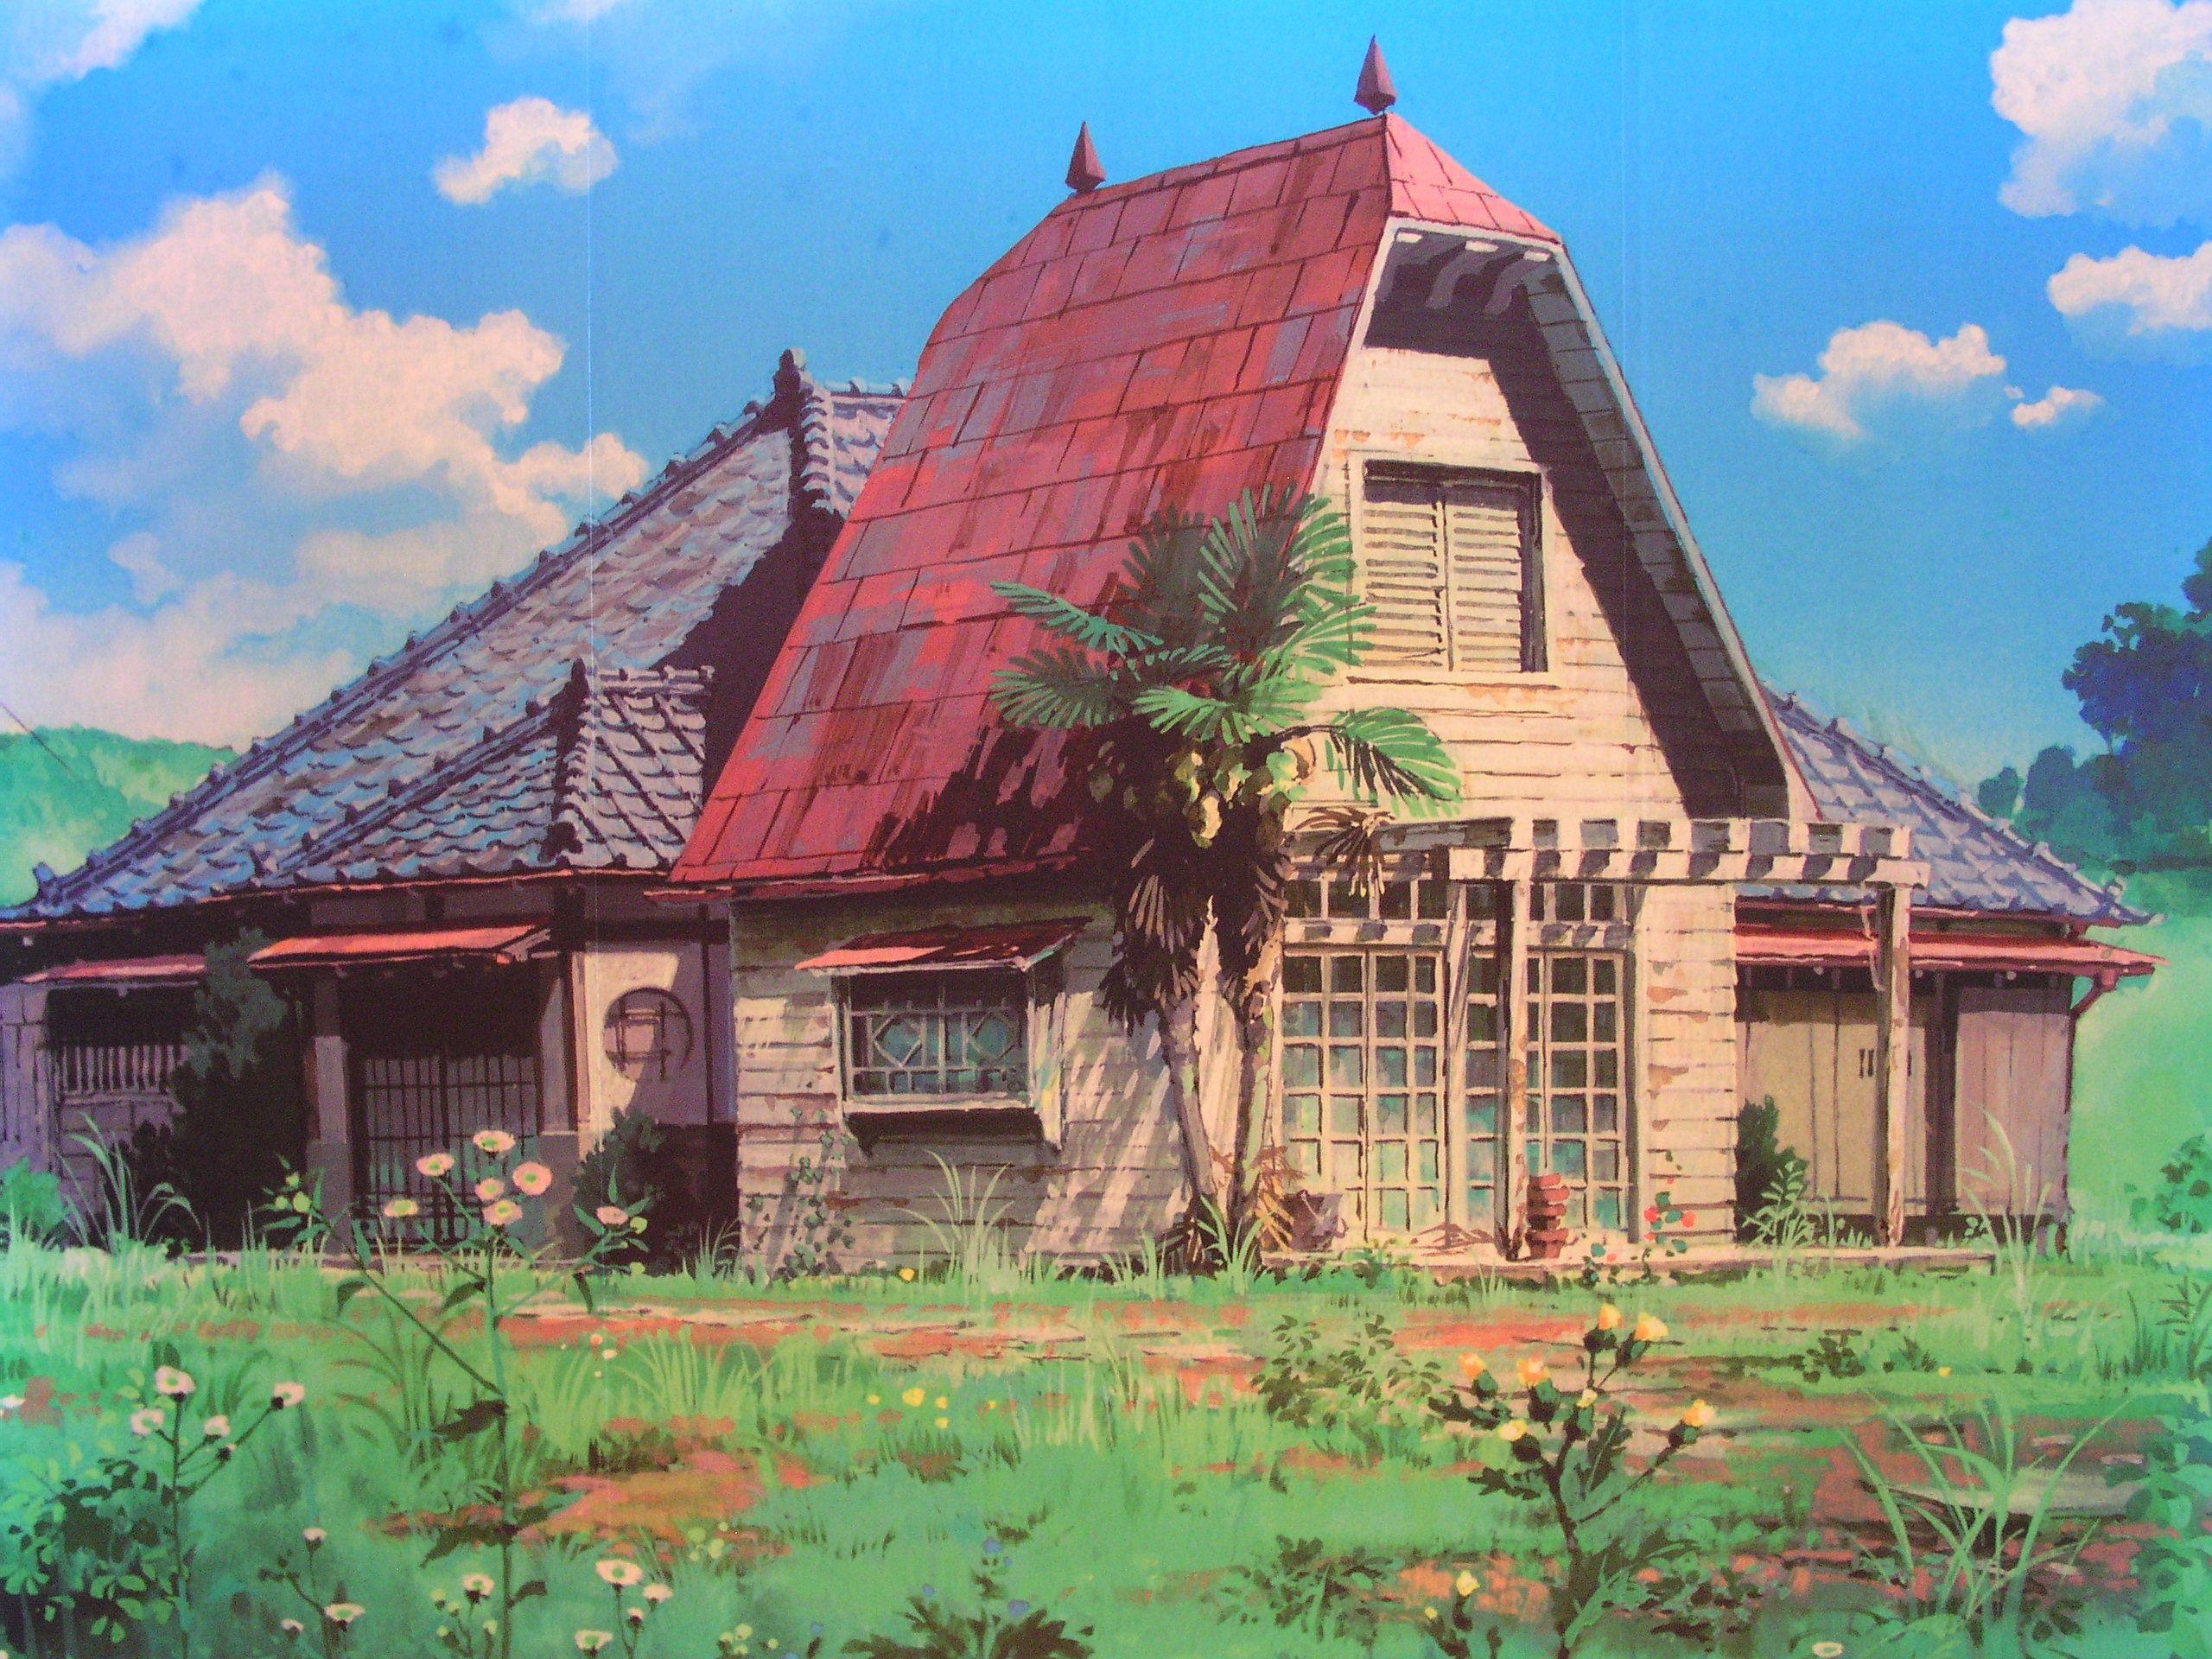 My Neighbor Totoro となりのトトロ By Kazuo Oga Background Art C Studio Ghibli Blog Website Www Ghibli Jp Character レトロ 背景 風景の絵 幻想的なイラスト